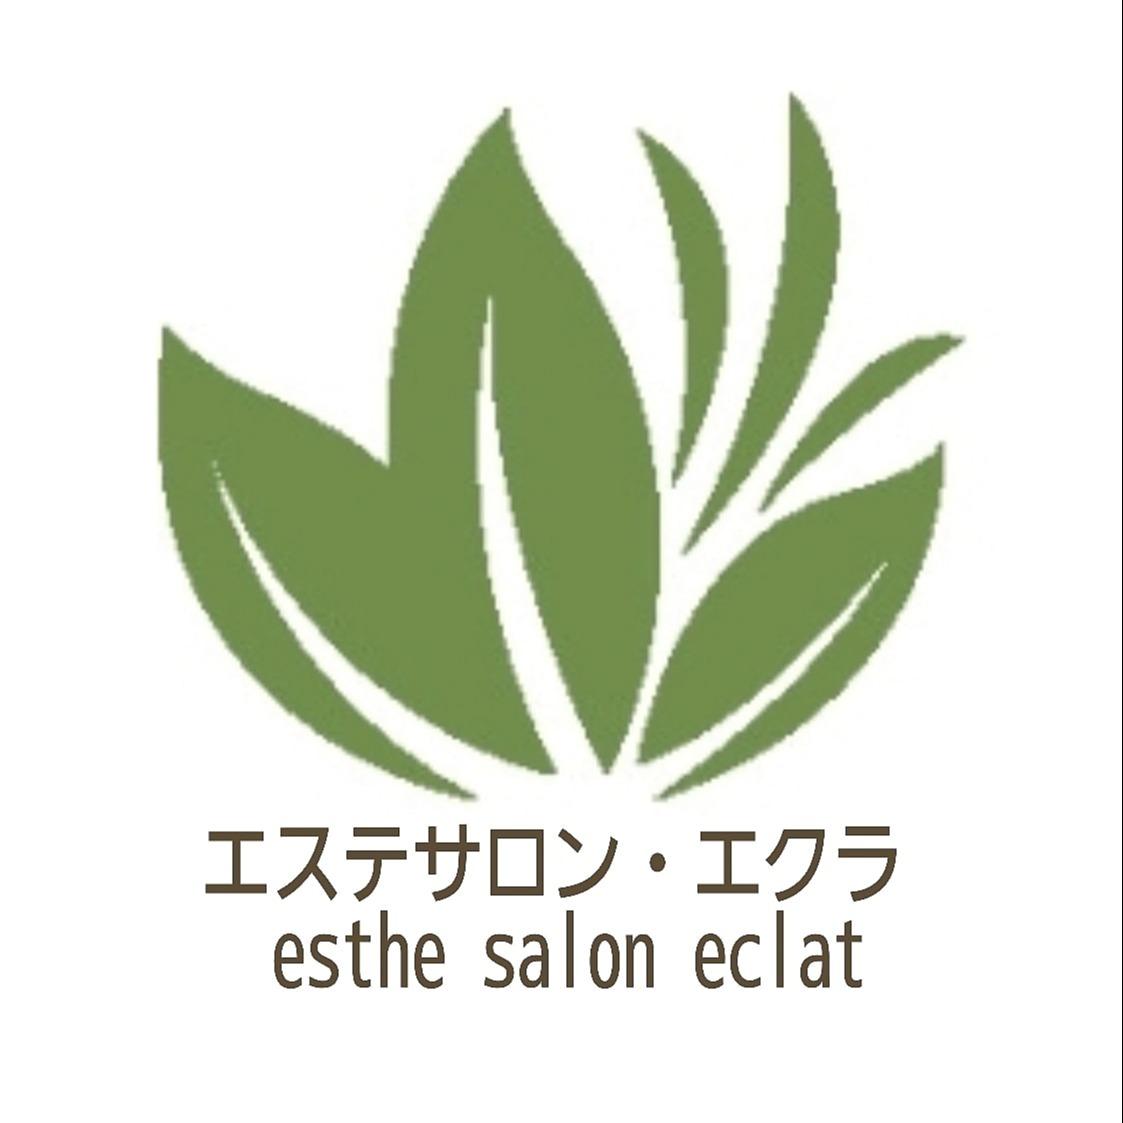 @tomokoiwakiri Profile Image | Linktree